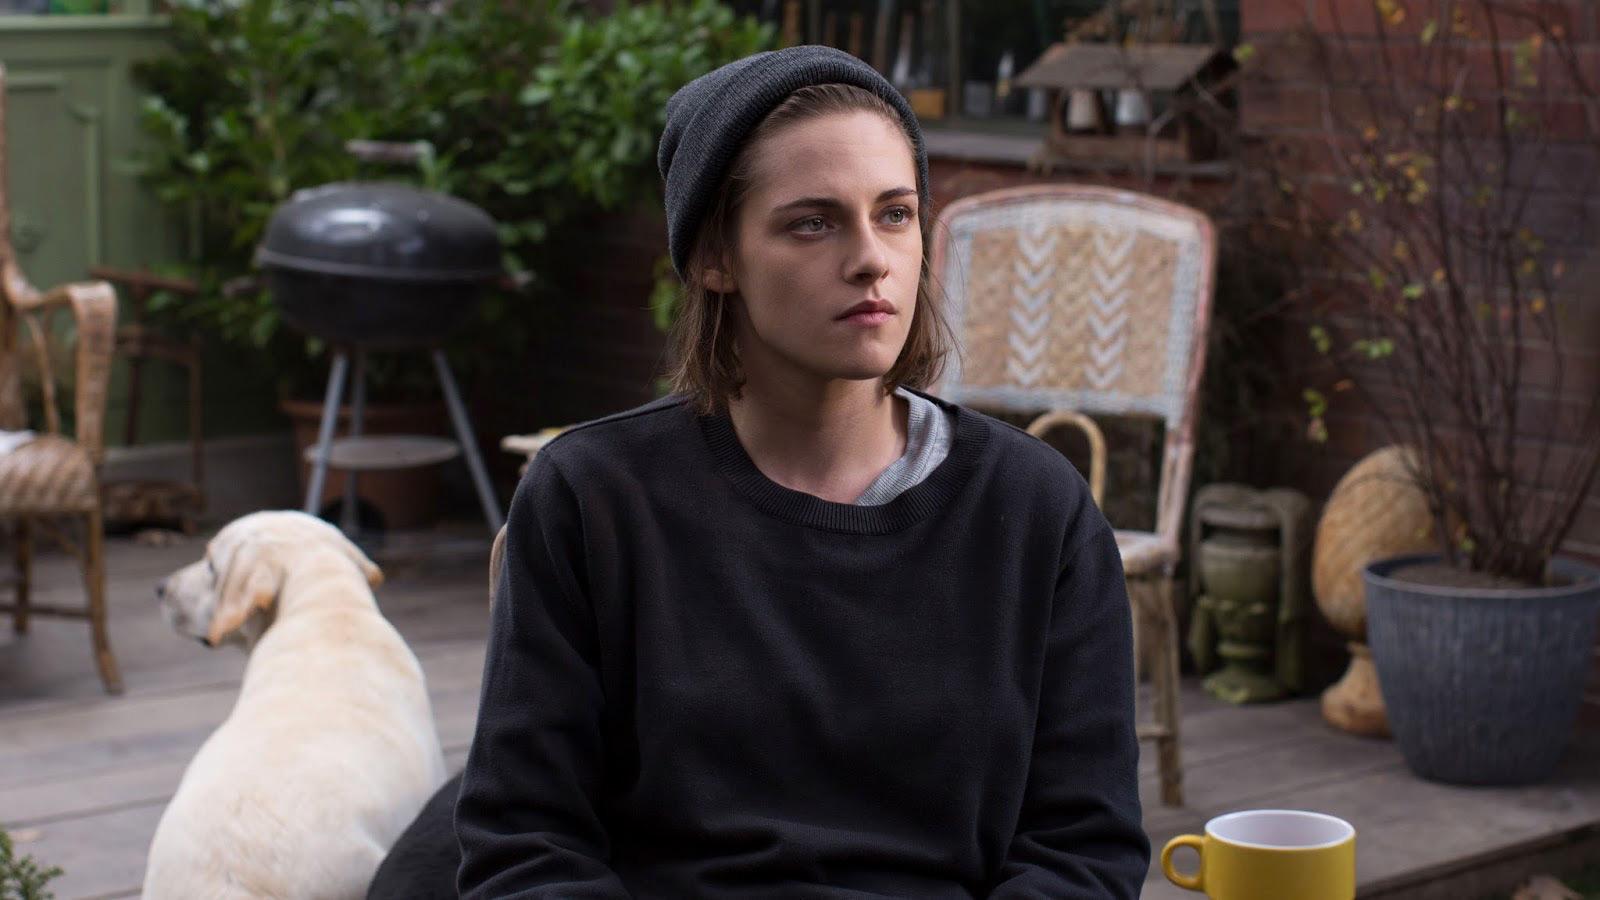 New-Kristen-Stewart-Personal-Shopper-Still-13